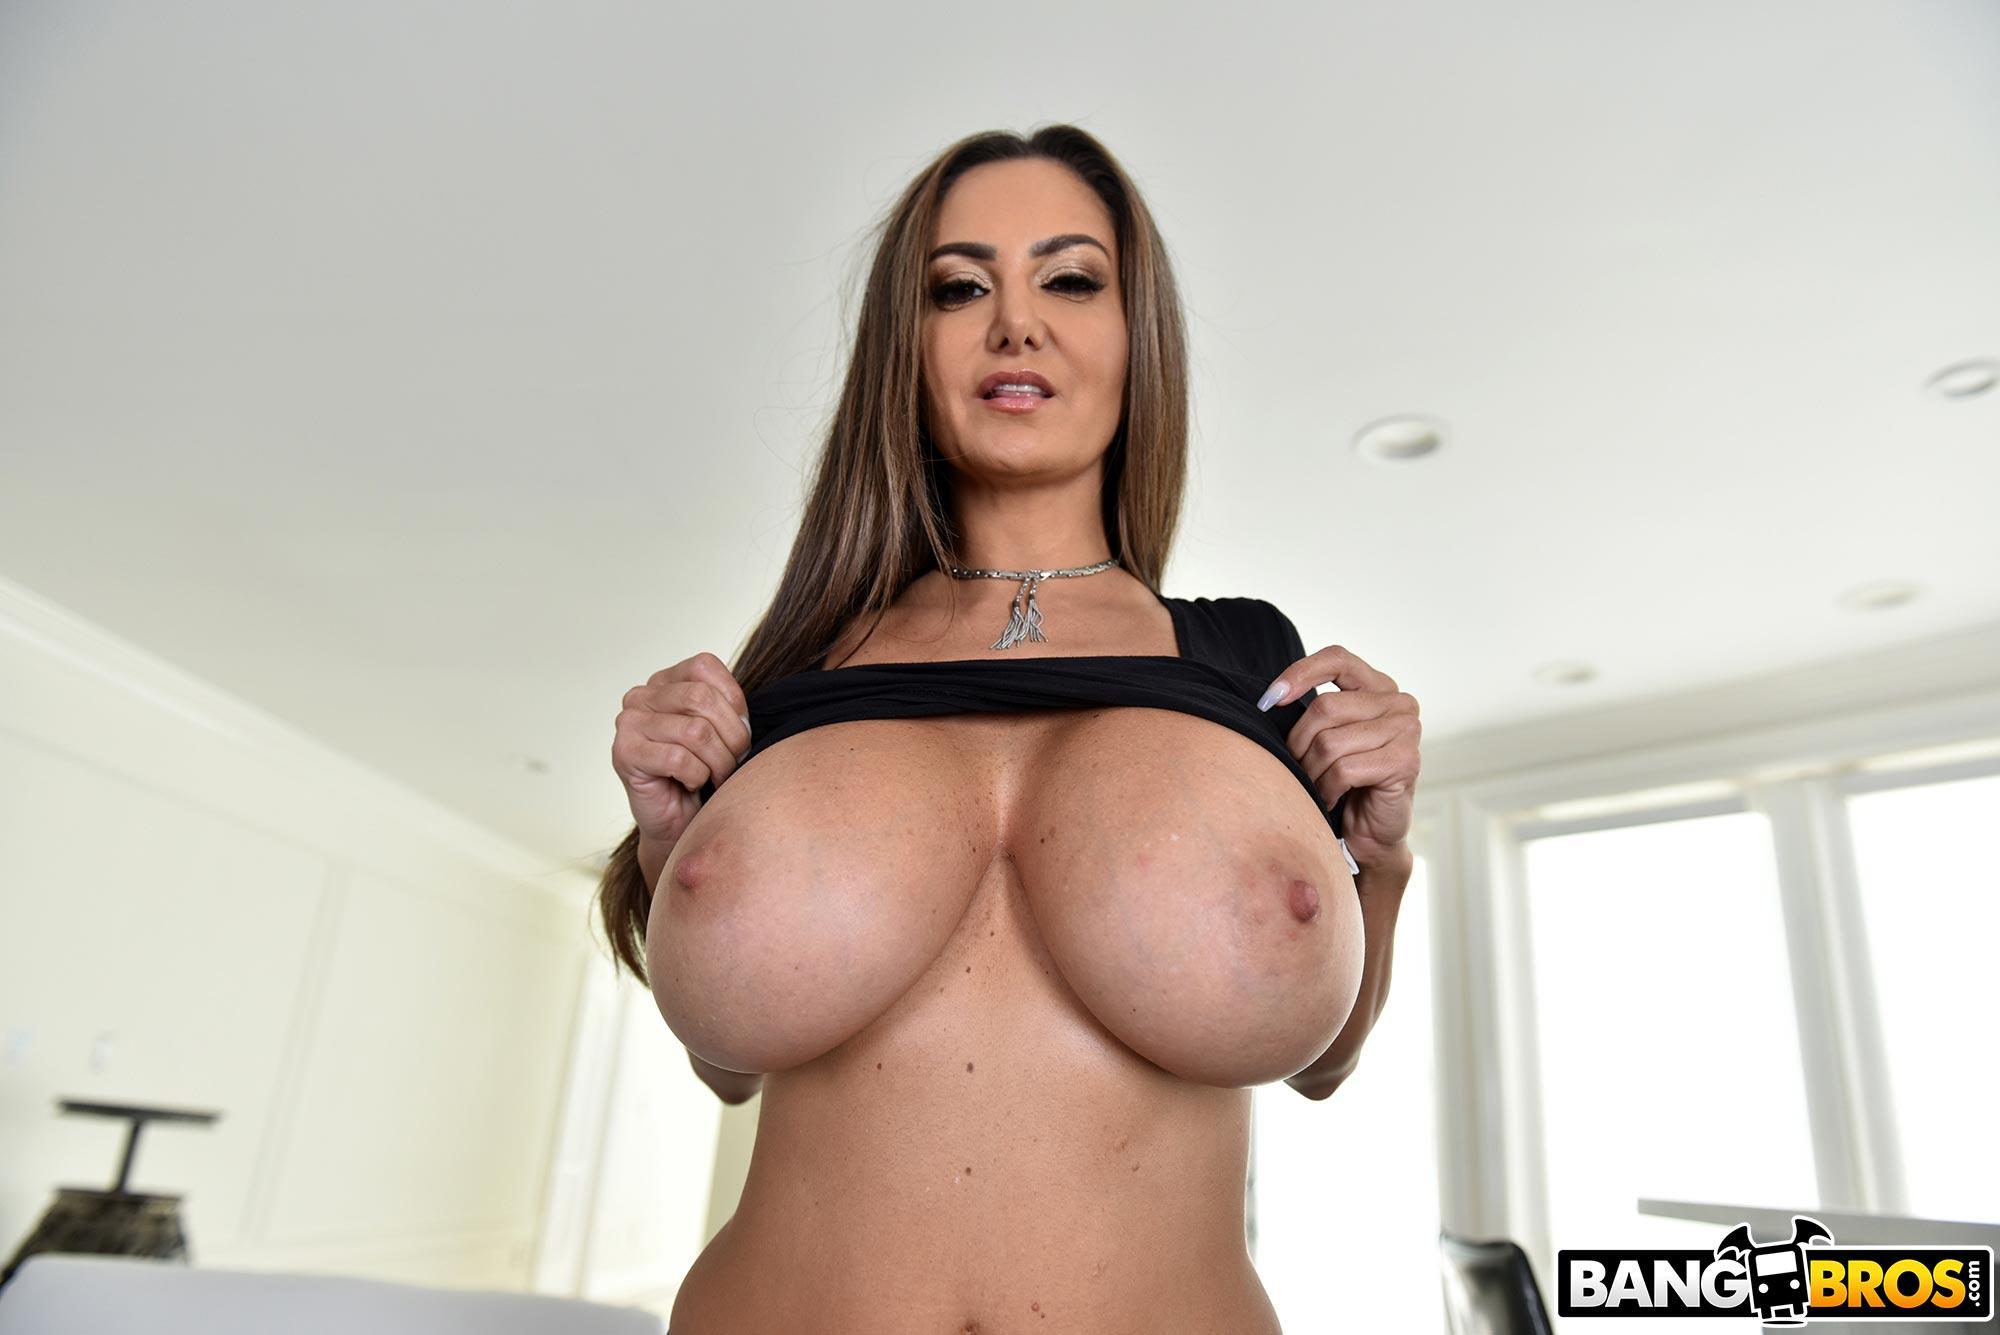 Ava addams lets pervert stepson enjoy her monster boobs